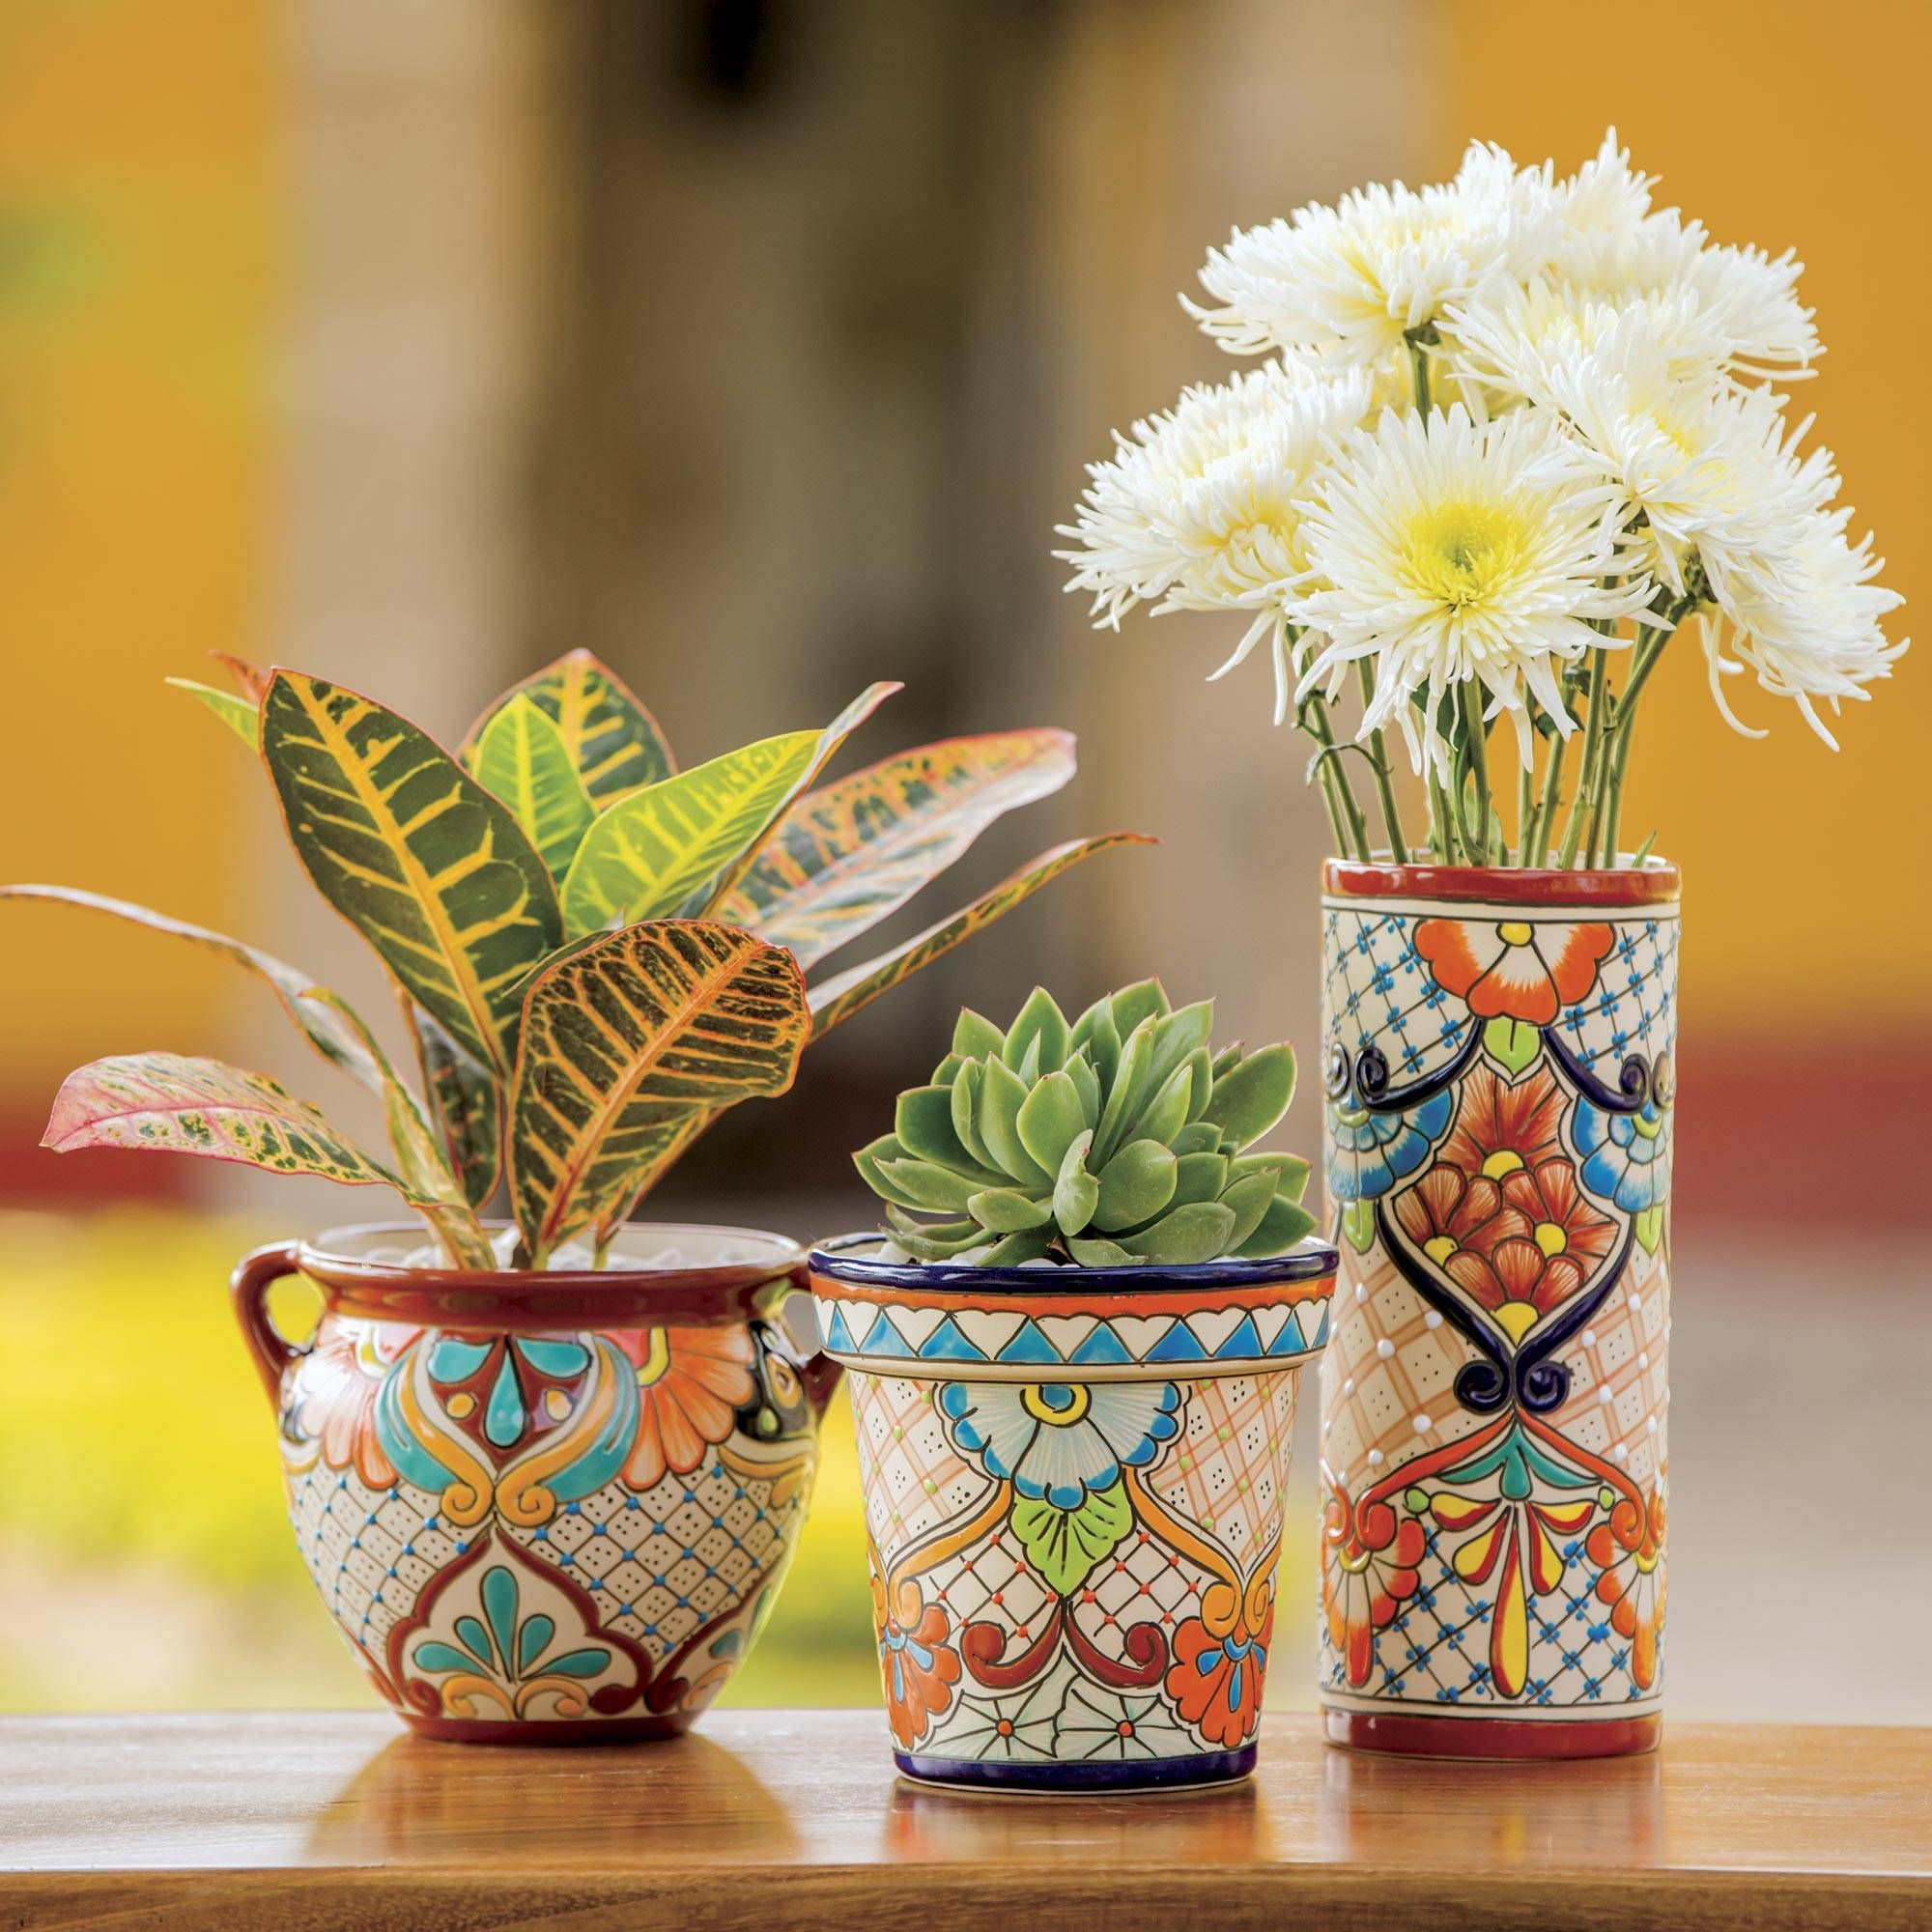 Ceramic Flower Pot Garden Fiesta In 2020 Ceramic Flower Pots Ceramic Flowers Flower Pots